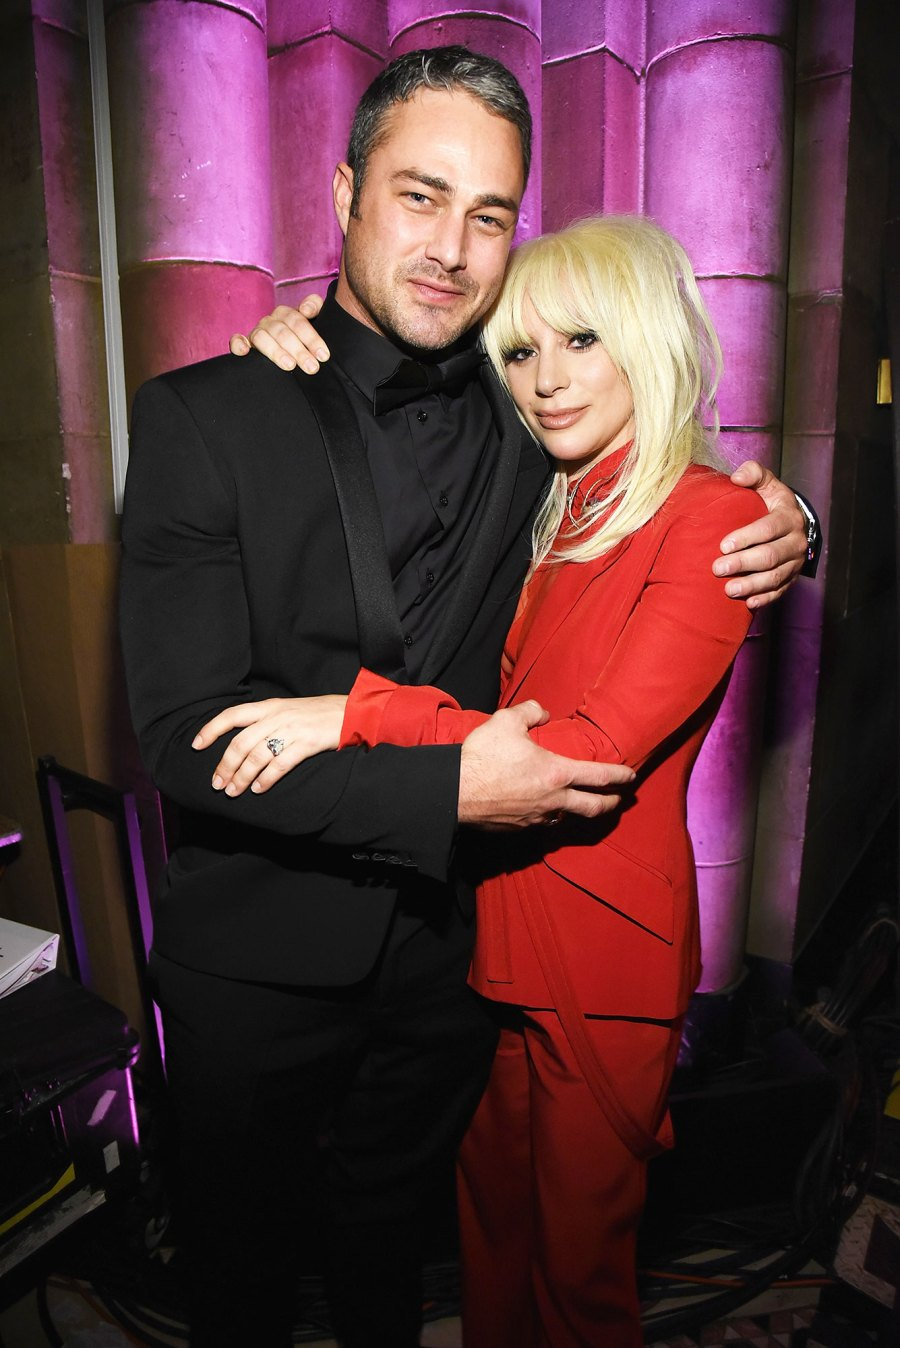 Taylor Kinney (L) and Lady Gaga